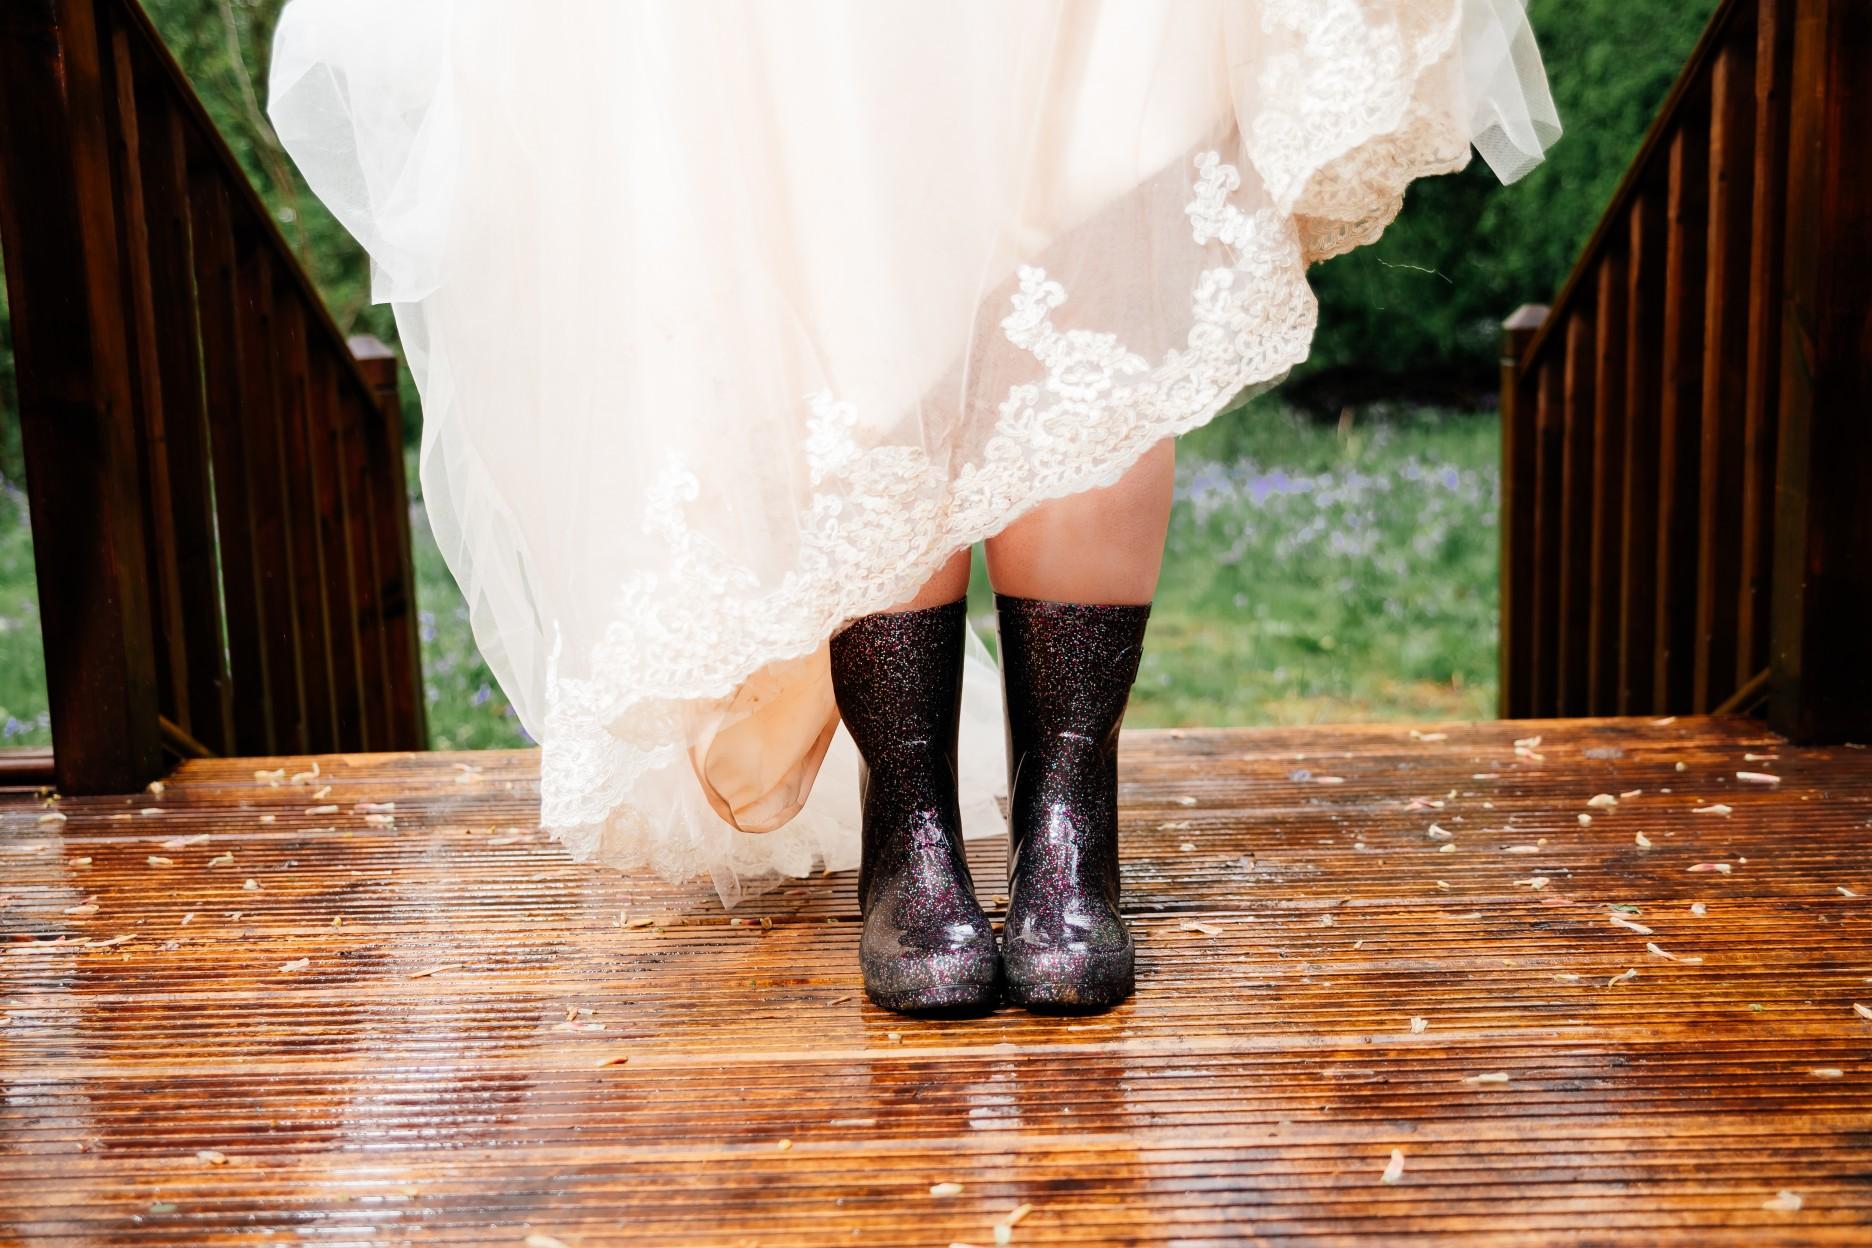 bride in wellies - rainy wedding - rain wedding advice - fun wedding planning - wedding planning blog - rain wedding photos